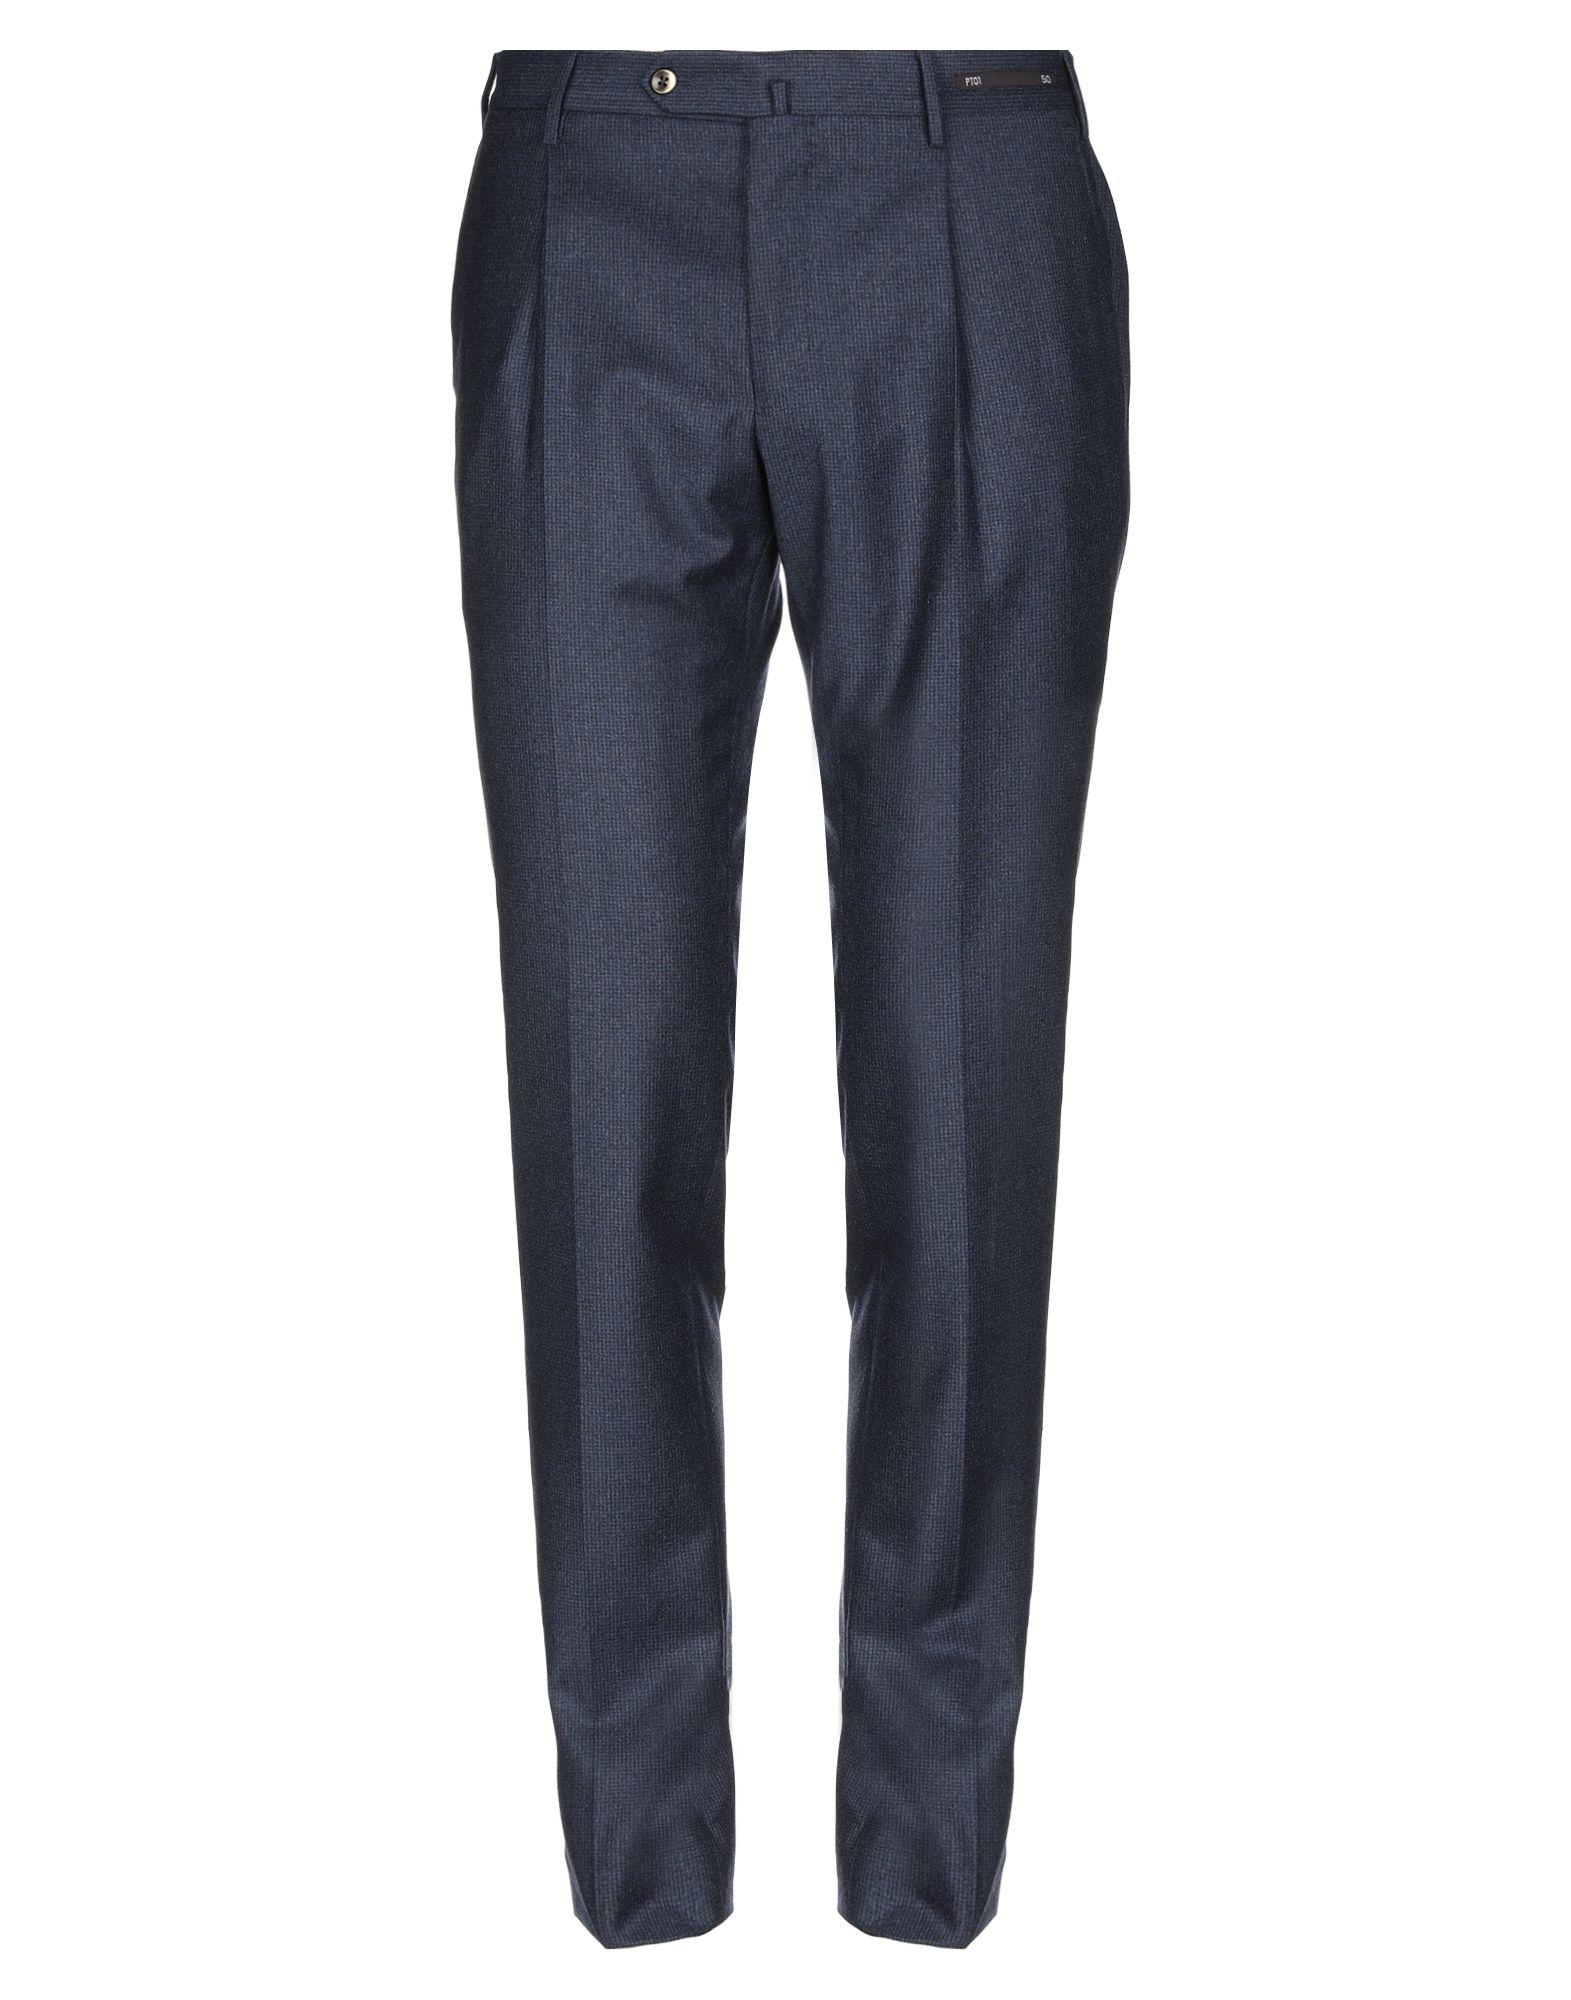 Pantalone Pt01 uomo uomo uomo - 13359207FU 2a0